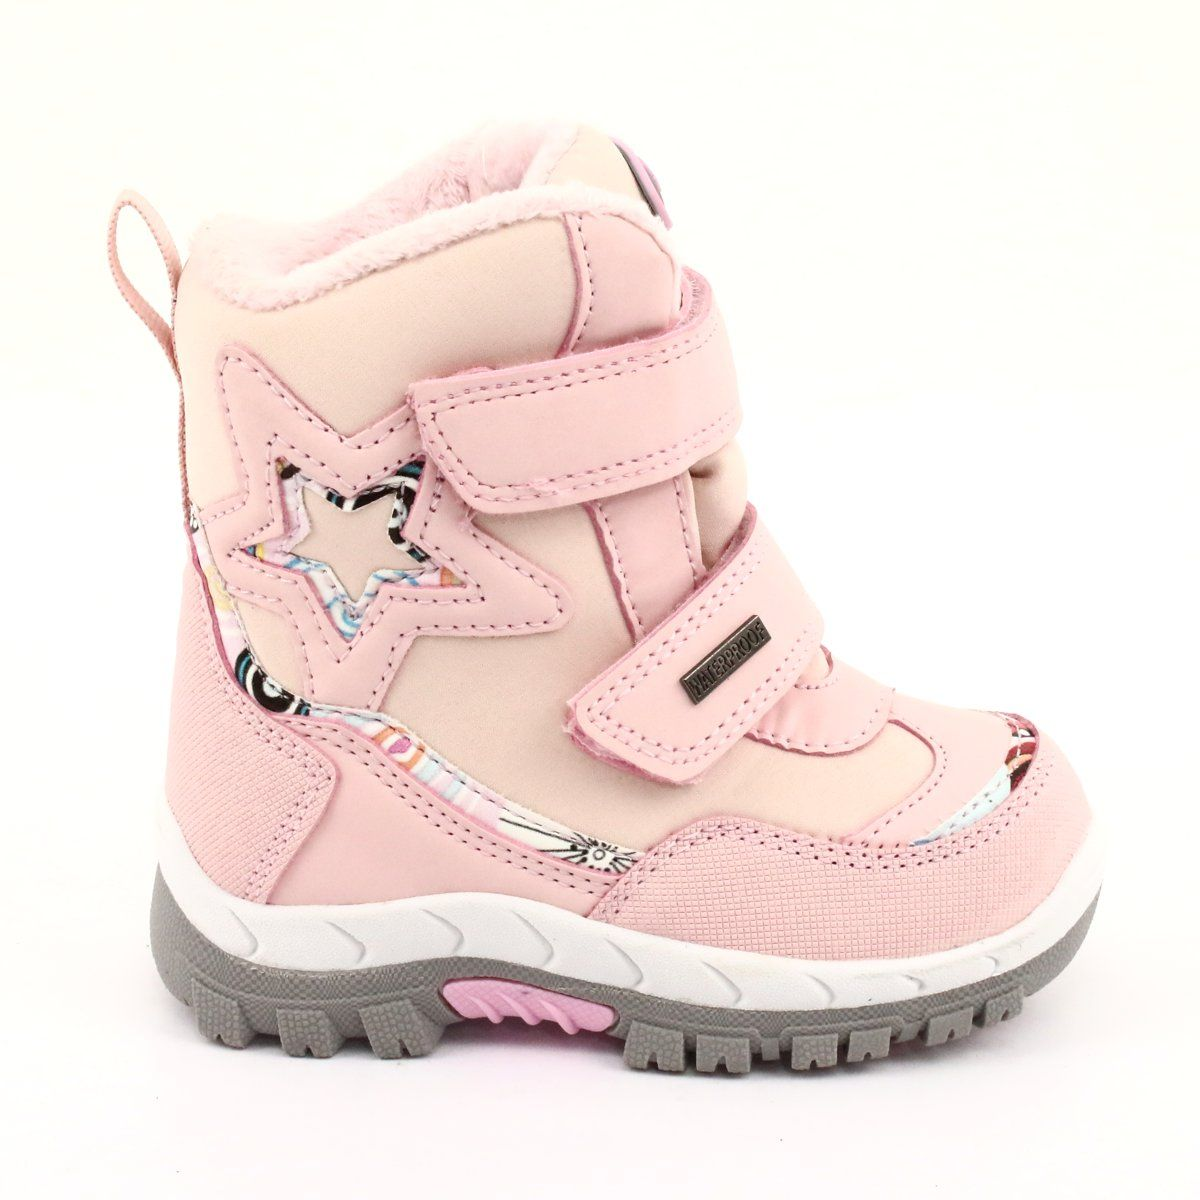 American Club Kozaki Z Membrana Rl37 Gwiazda Rozowe Childrens Boots Boots Kid Shoes